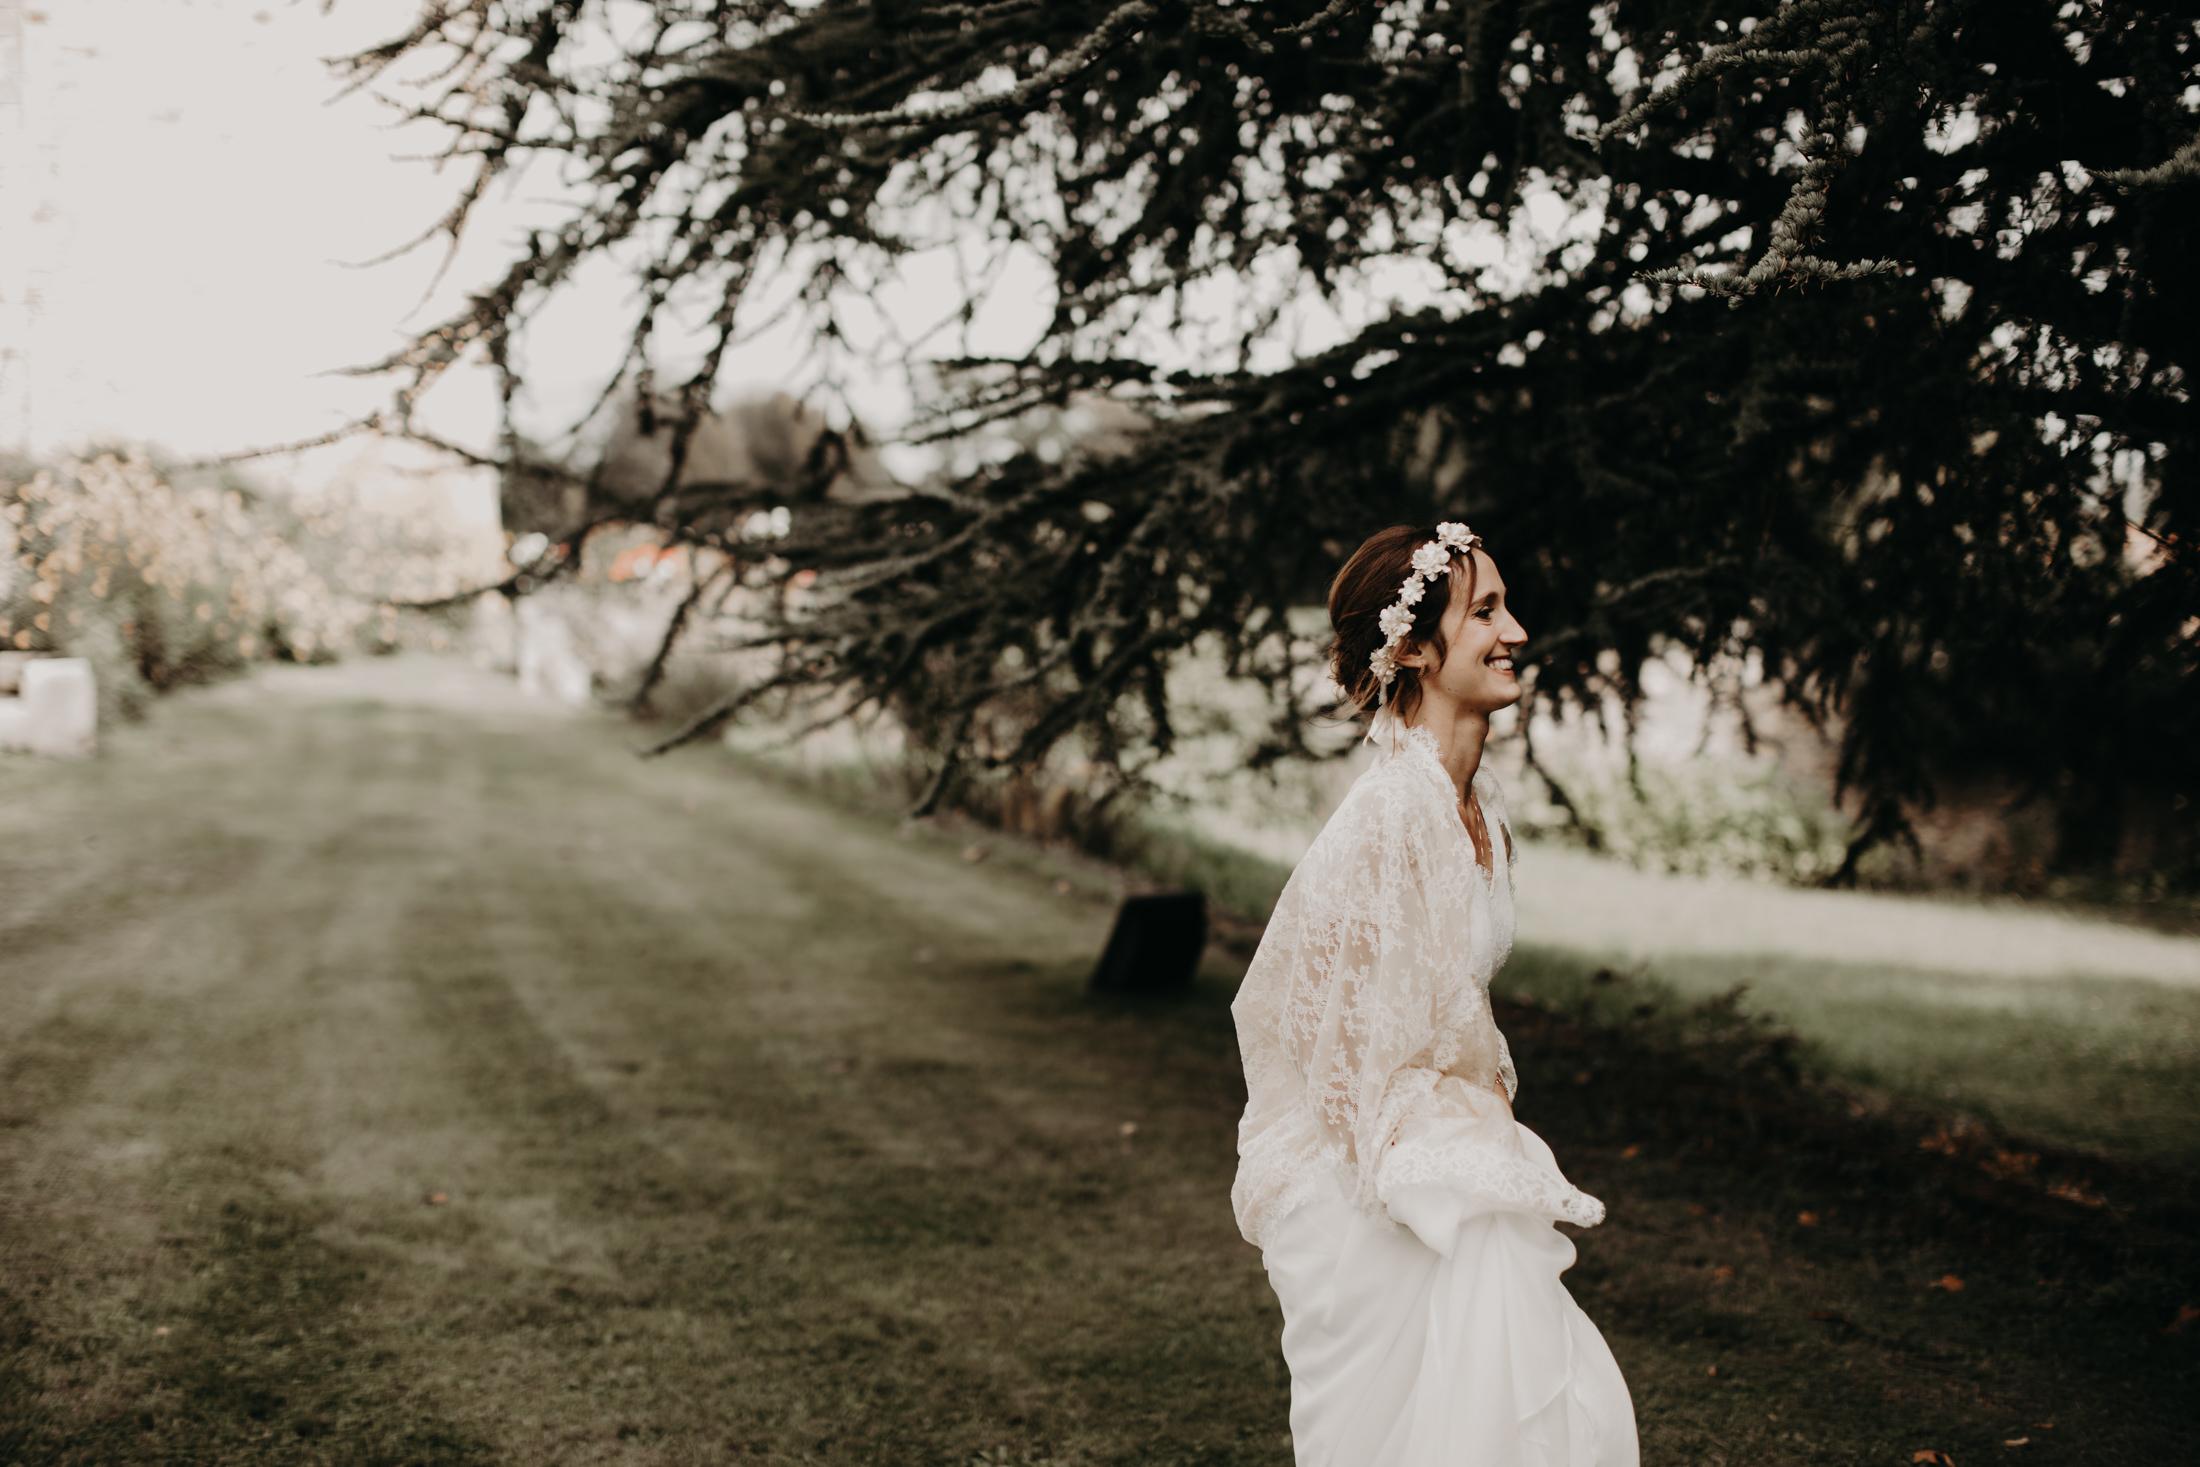 Mariage auvergne photographe wedding_-19.jpg